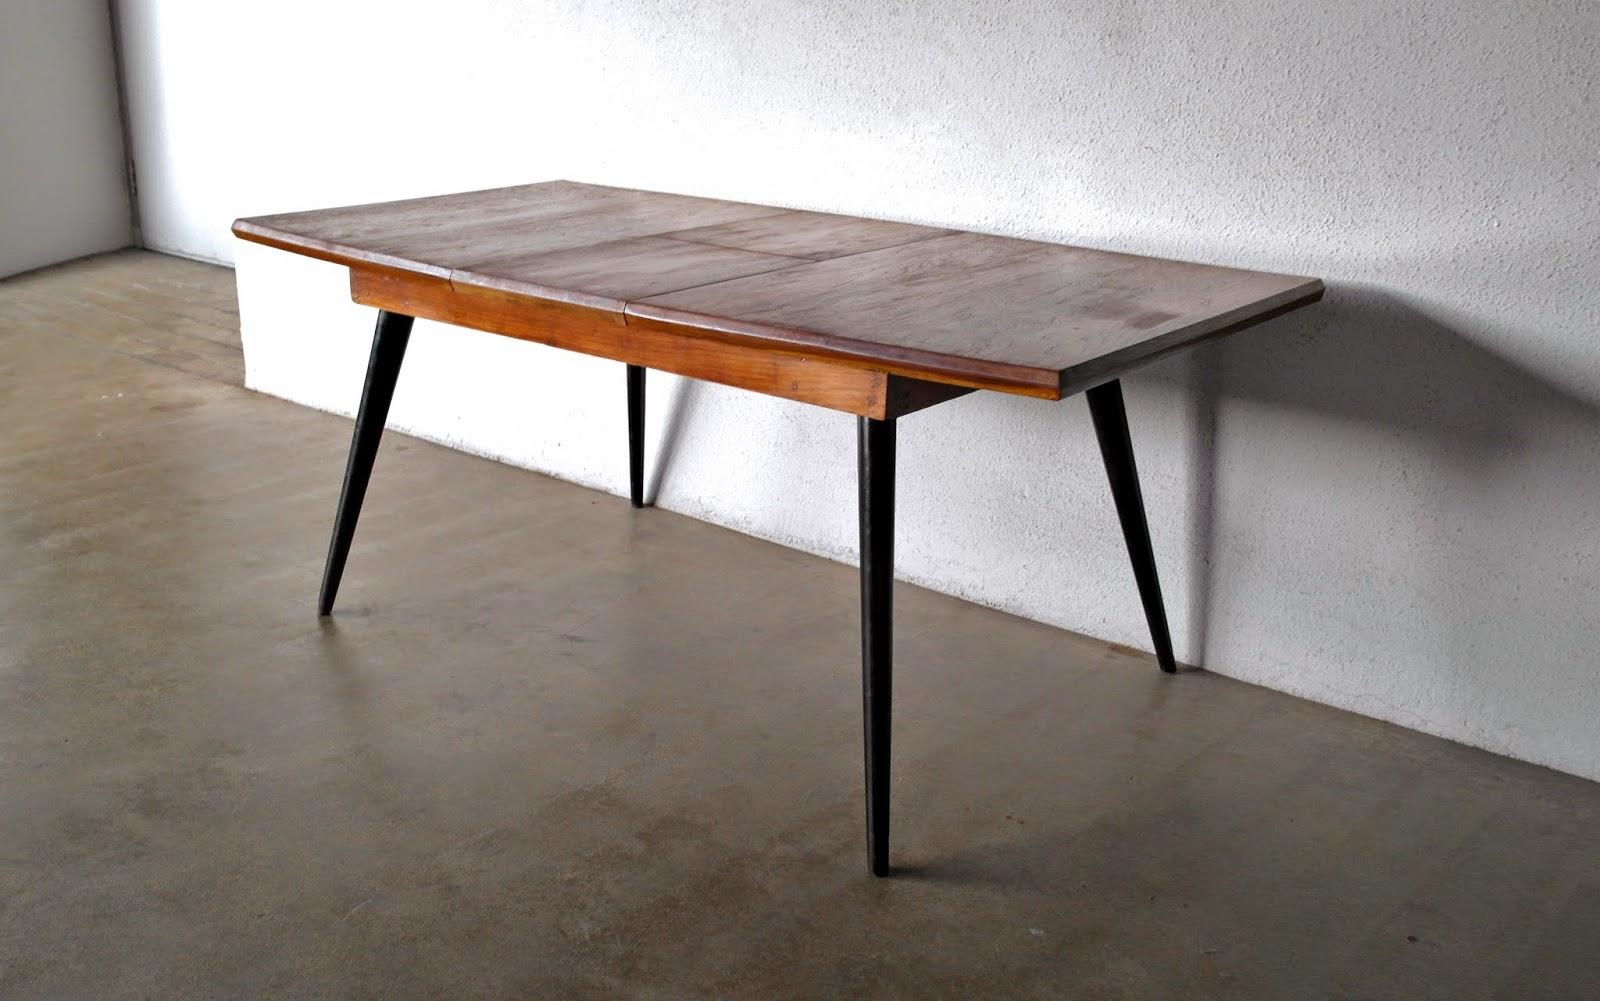 vintage 60s furniture. Vintage Midcentury 60\u0027s Extendable Dining Table In Solid Teak. 60s Furniture S